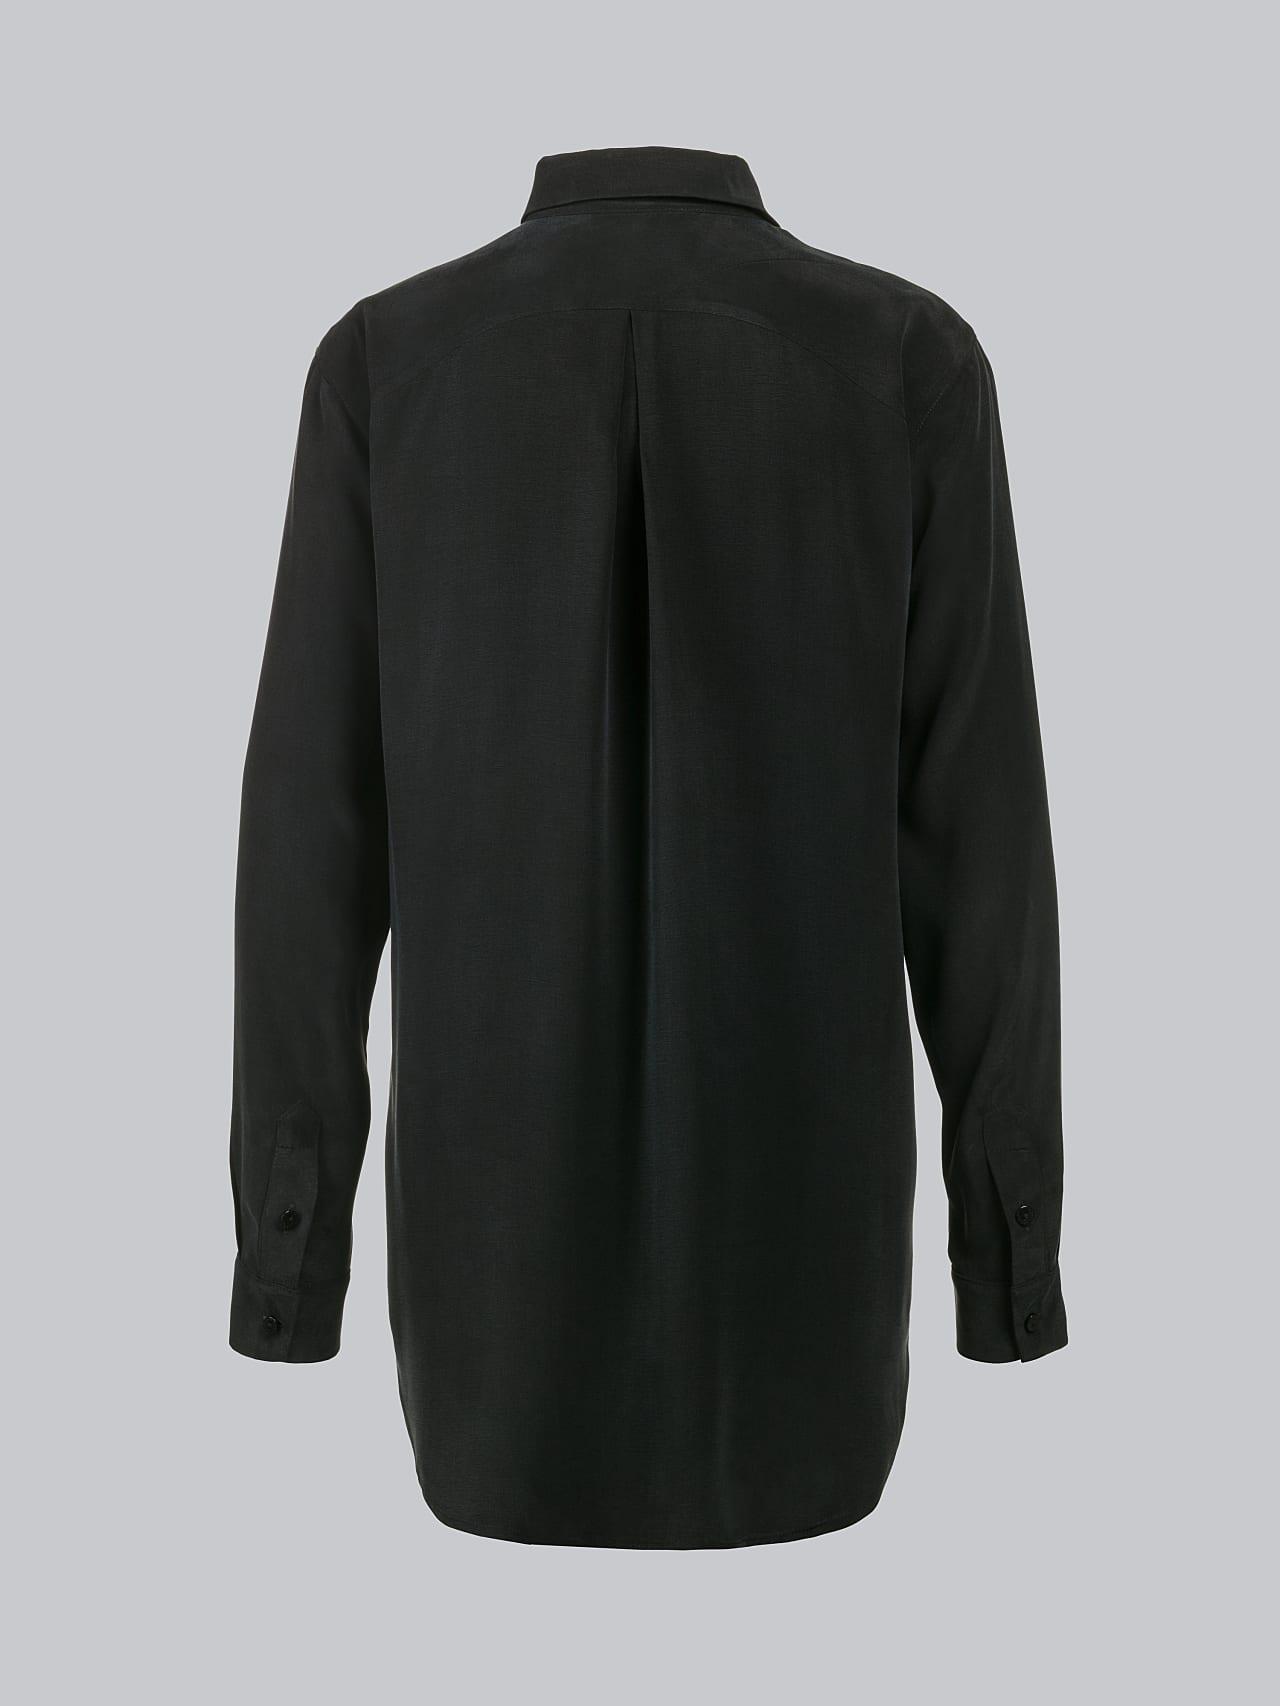 WYIN V3.Y3.02 Shiny Oversized Blouse black Left Alpha Tauri